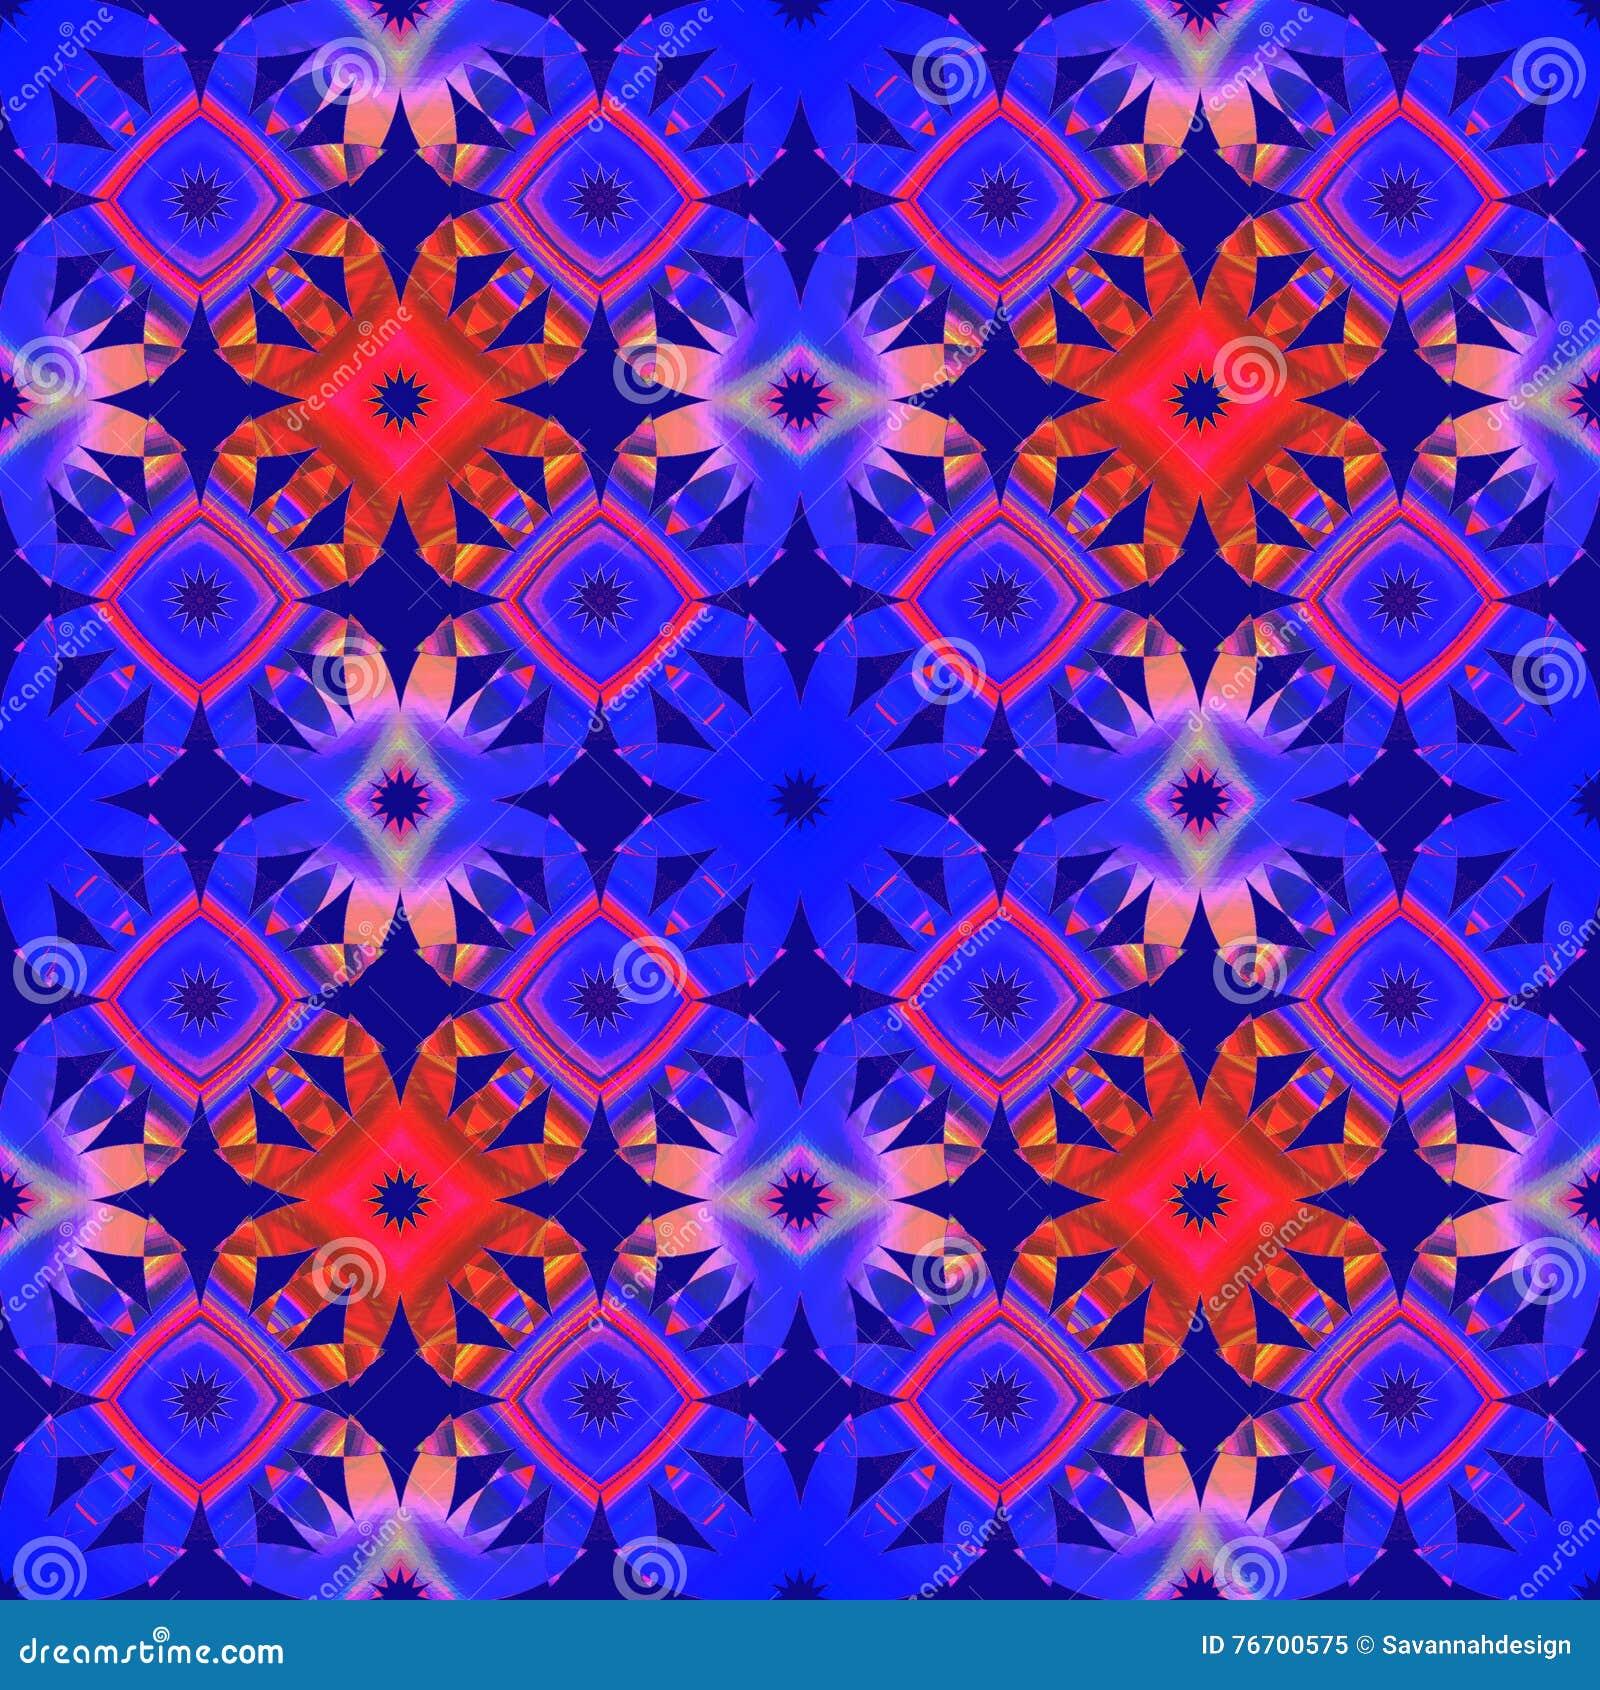 Seamless retro pattern orange blue